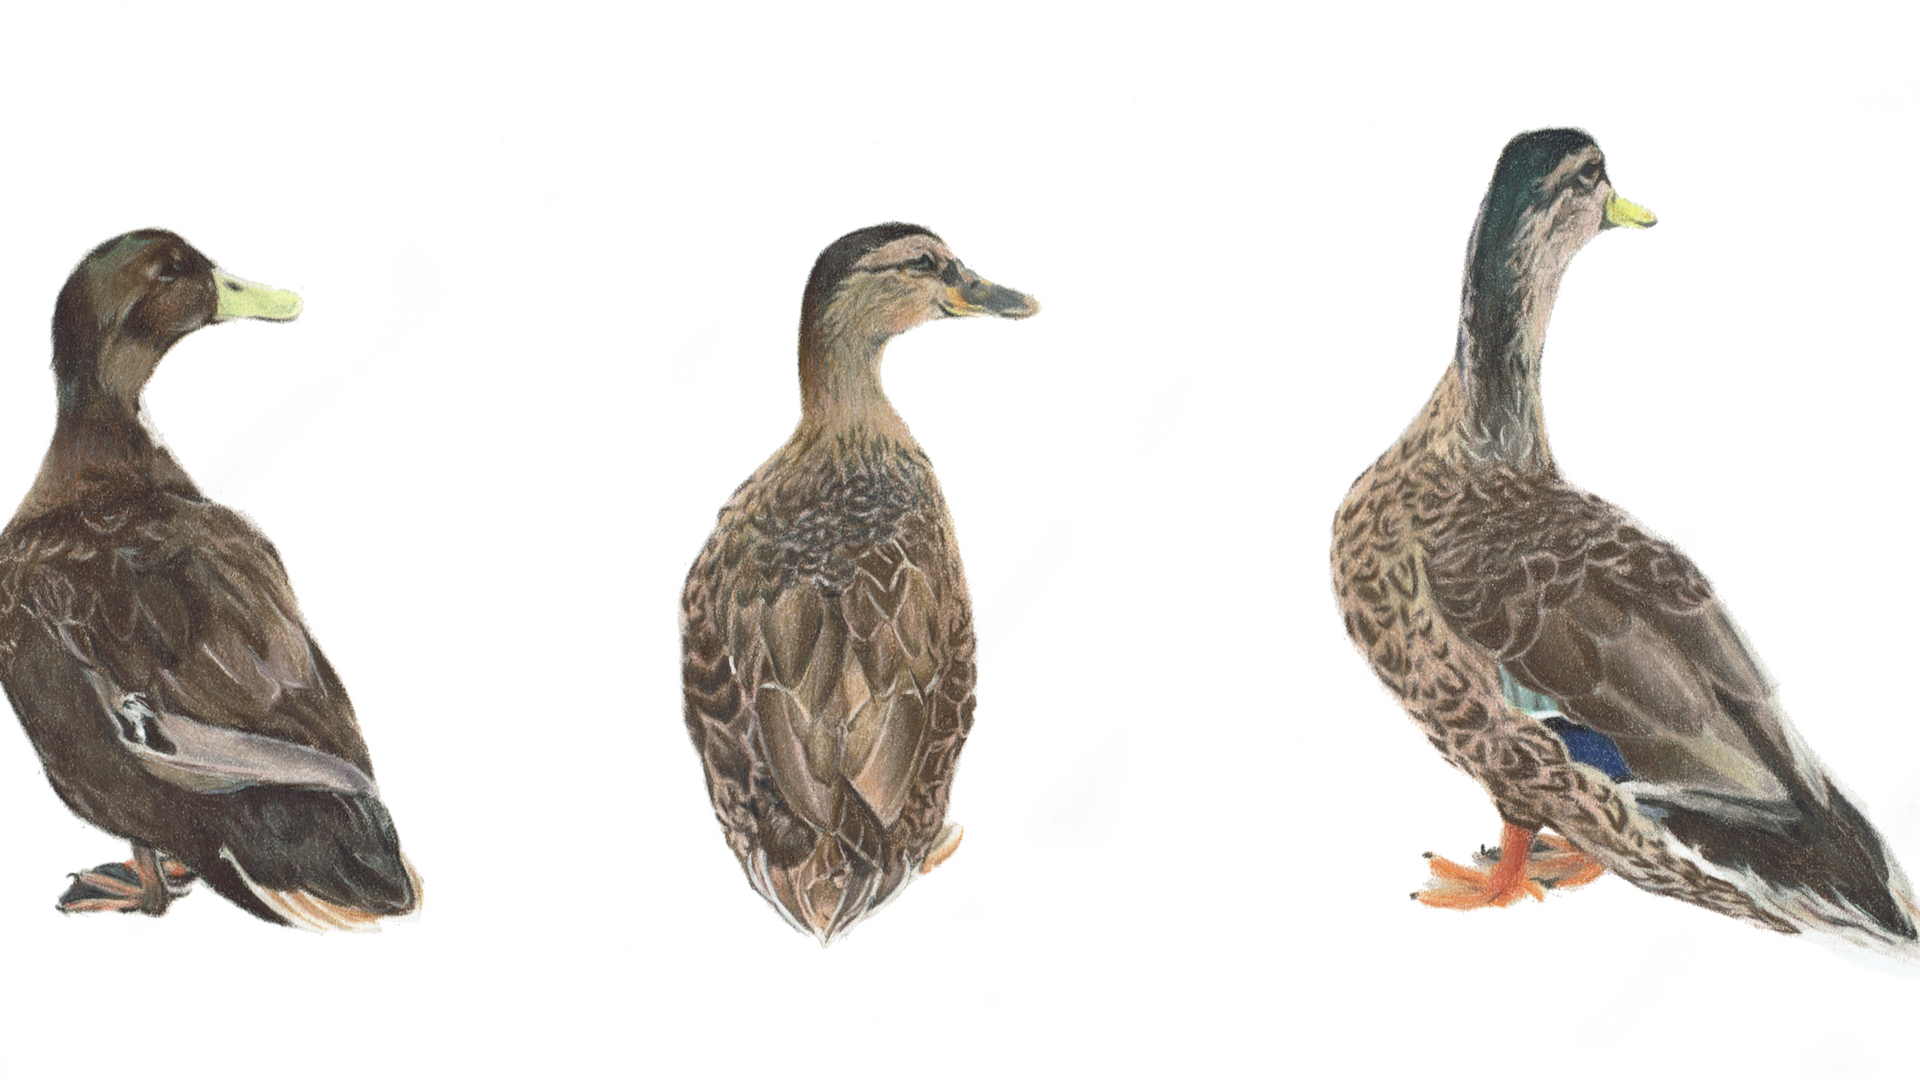 Ducks In A row 300dpicalendar.png